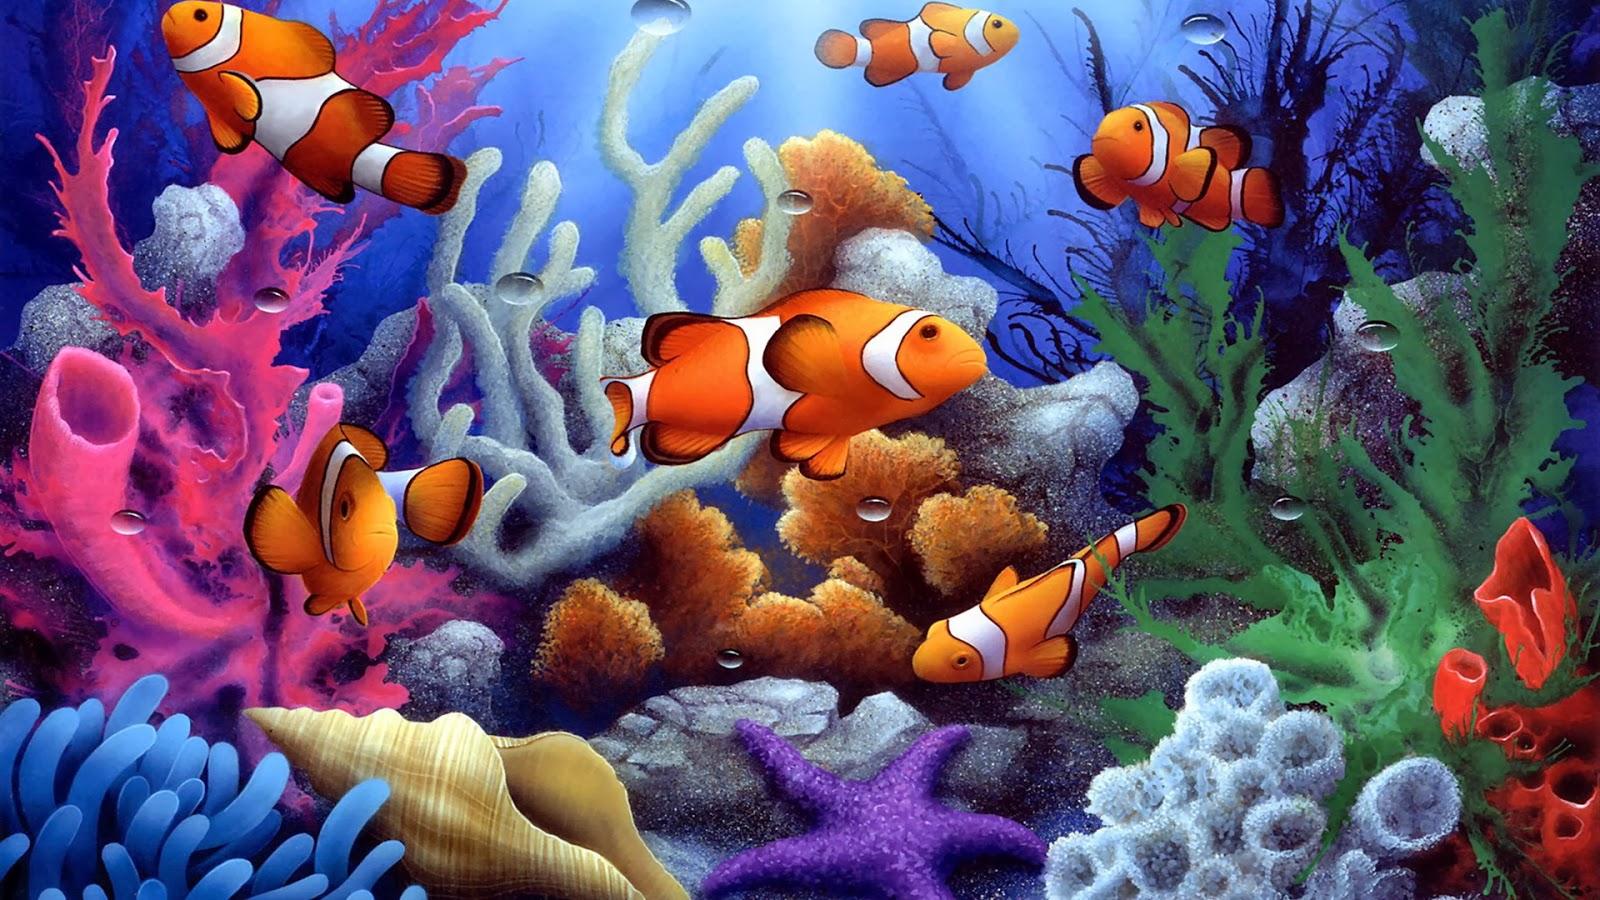 Яркие краски подводного мира  № 618905 без смс